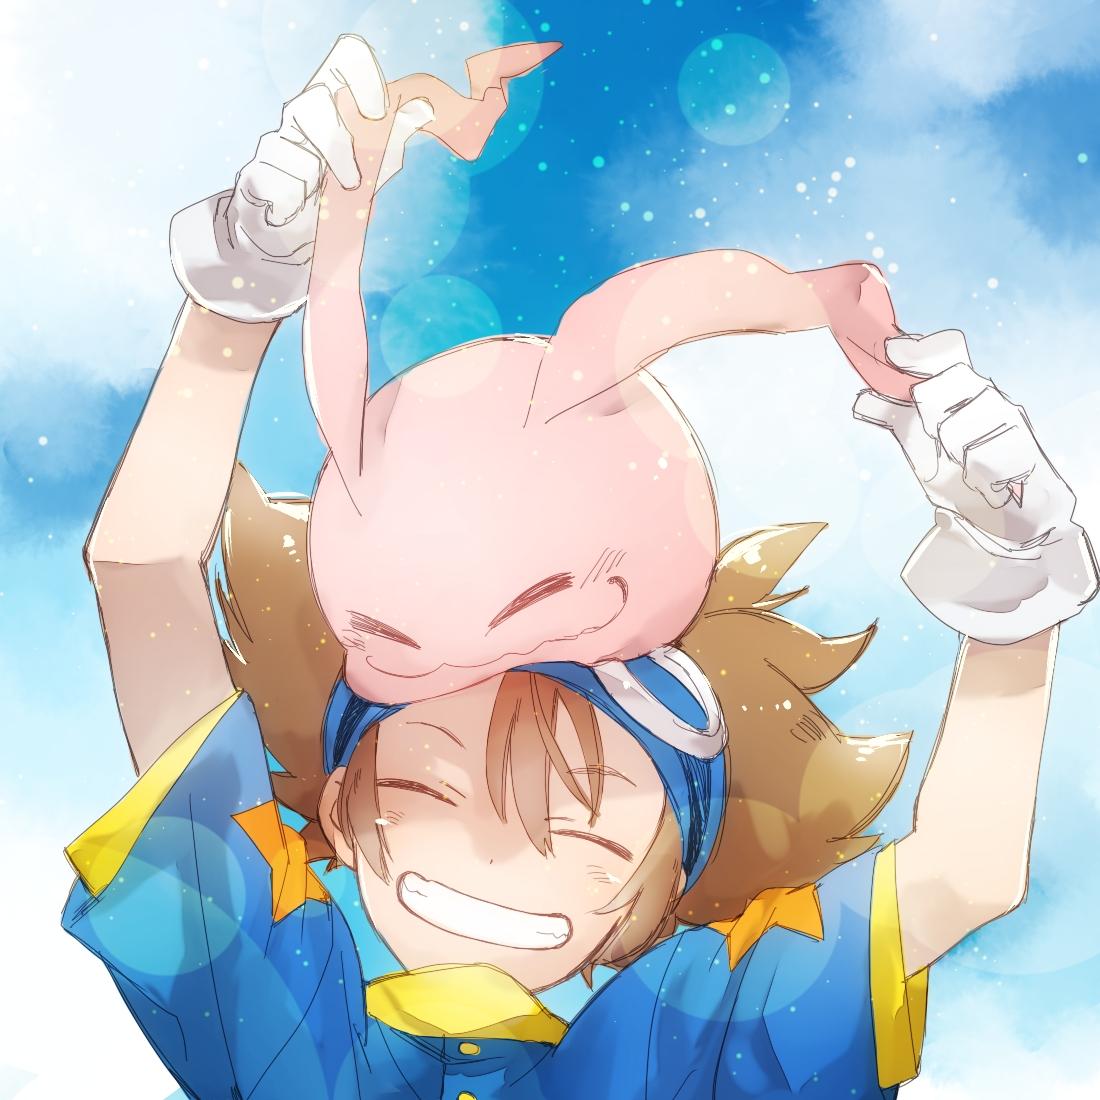 Digimon hentai fan art